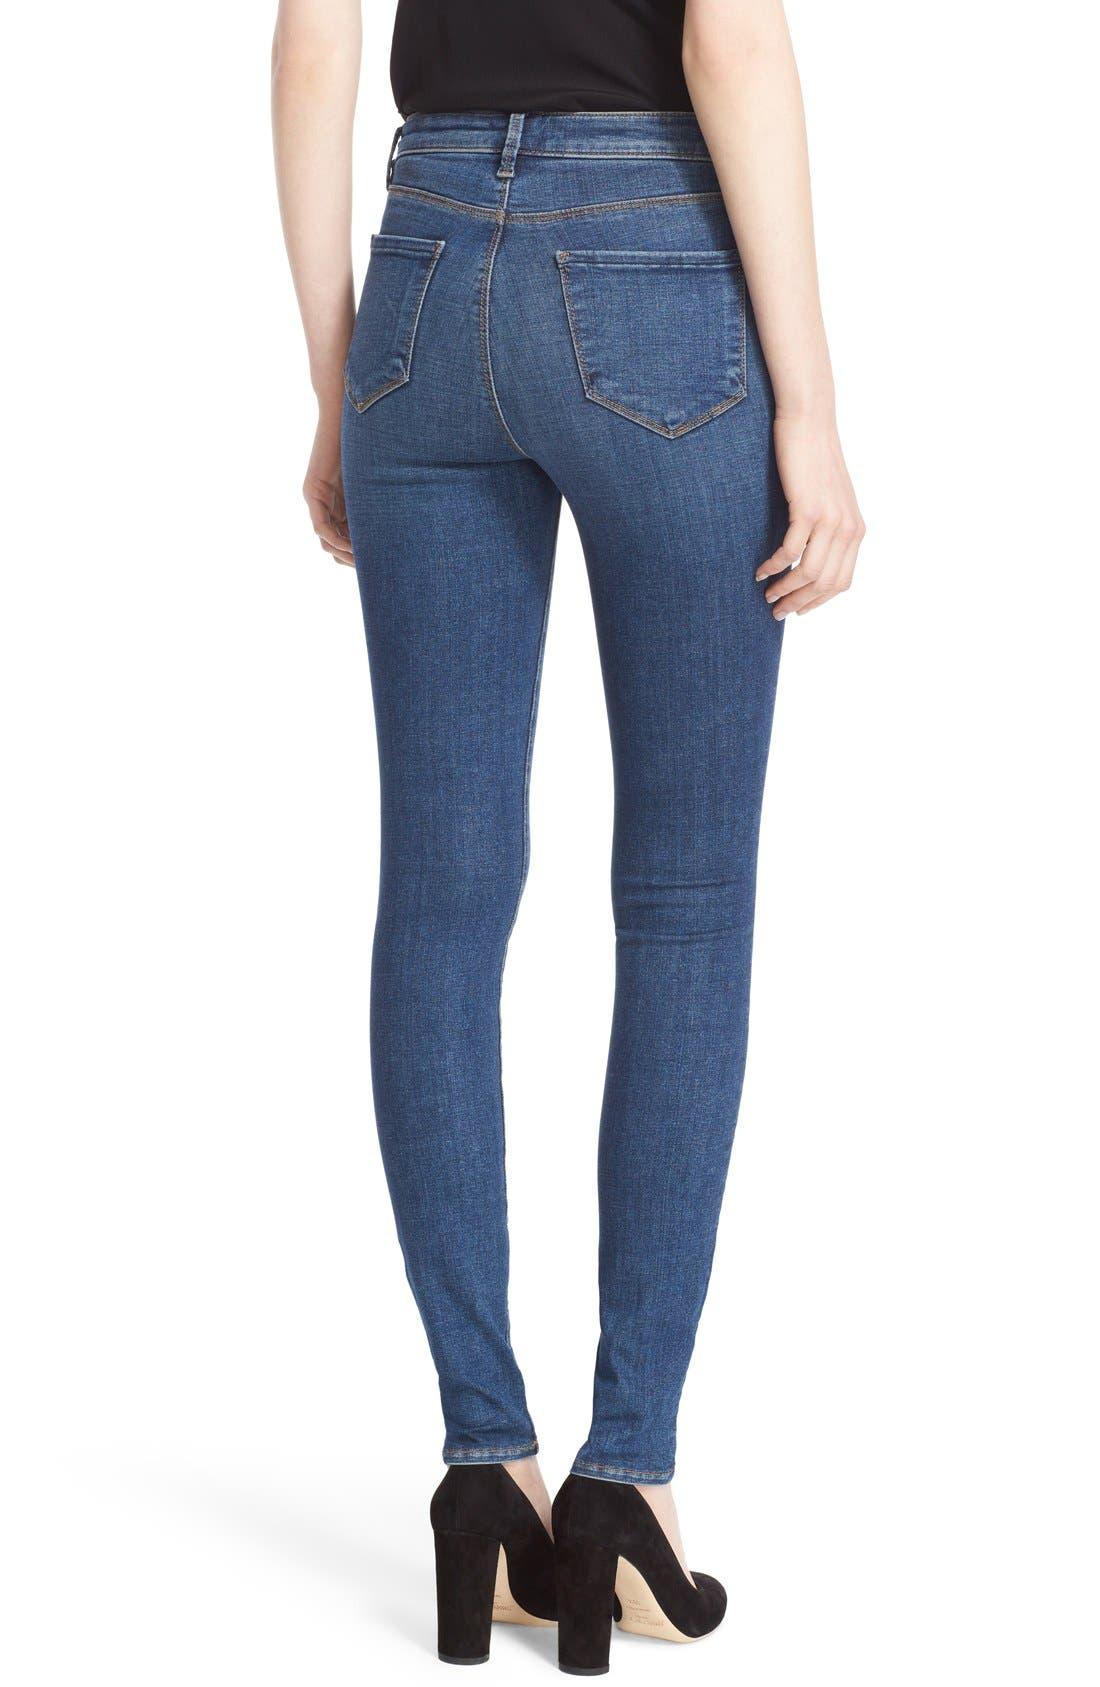 '30' High Rise Skinny Jeans,                             Alternate thumbnail 2, color,                             Dark Vintage